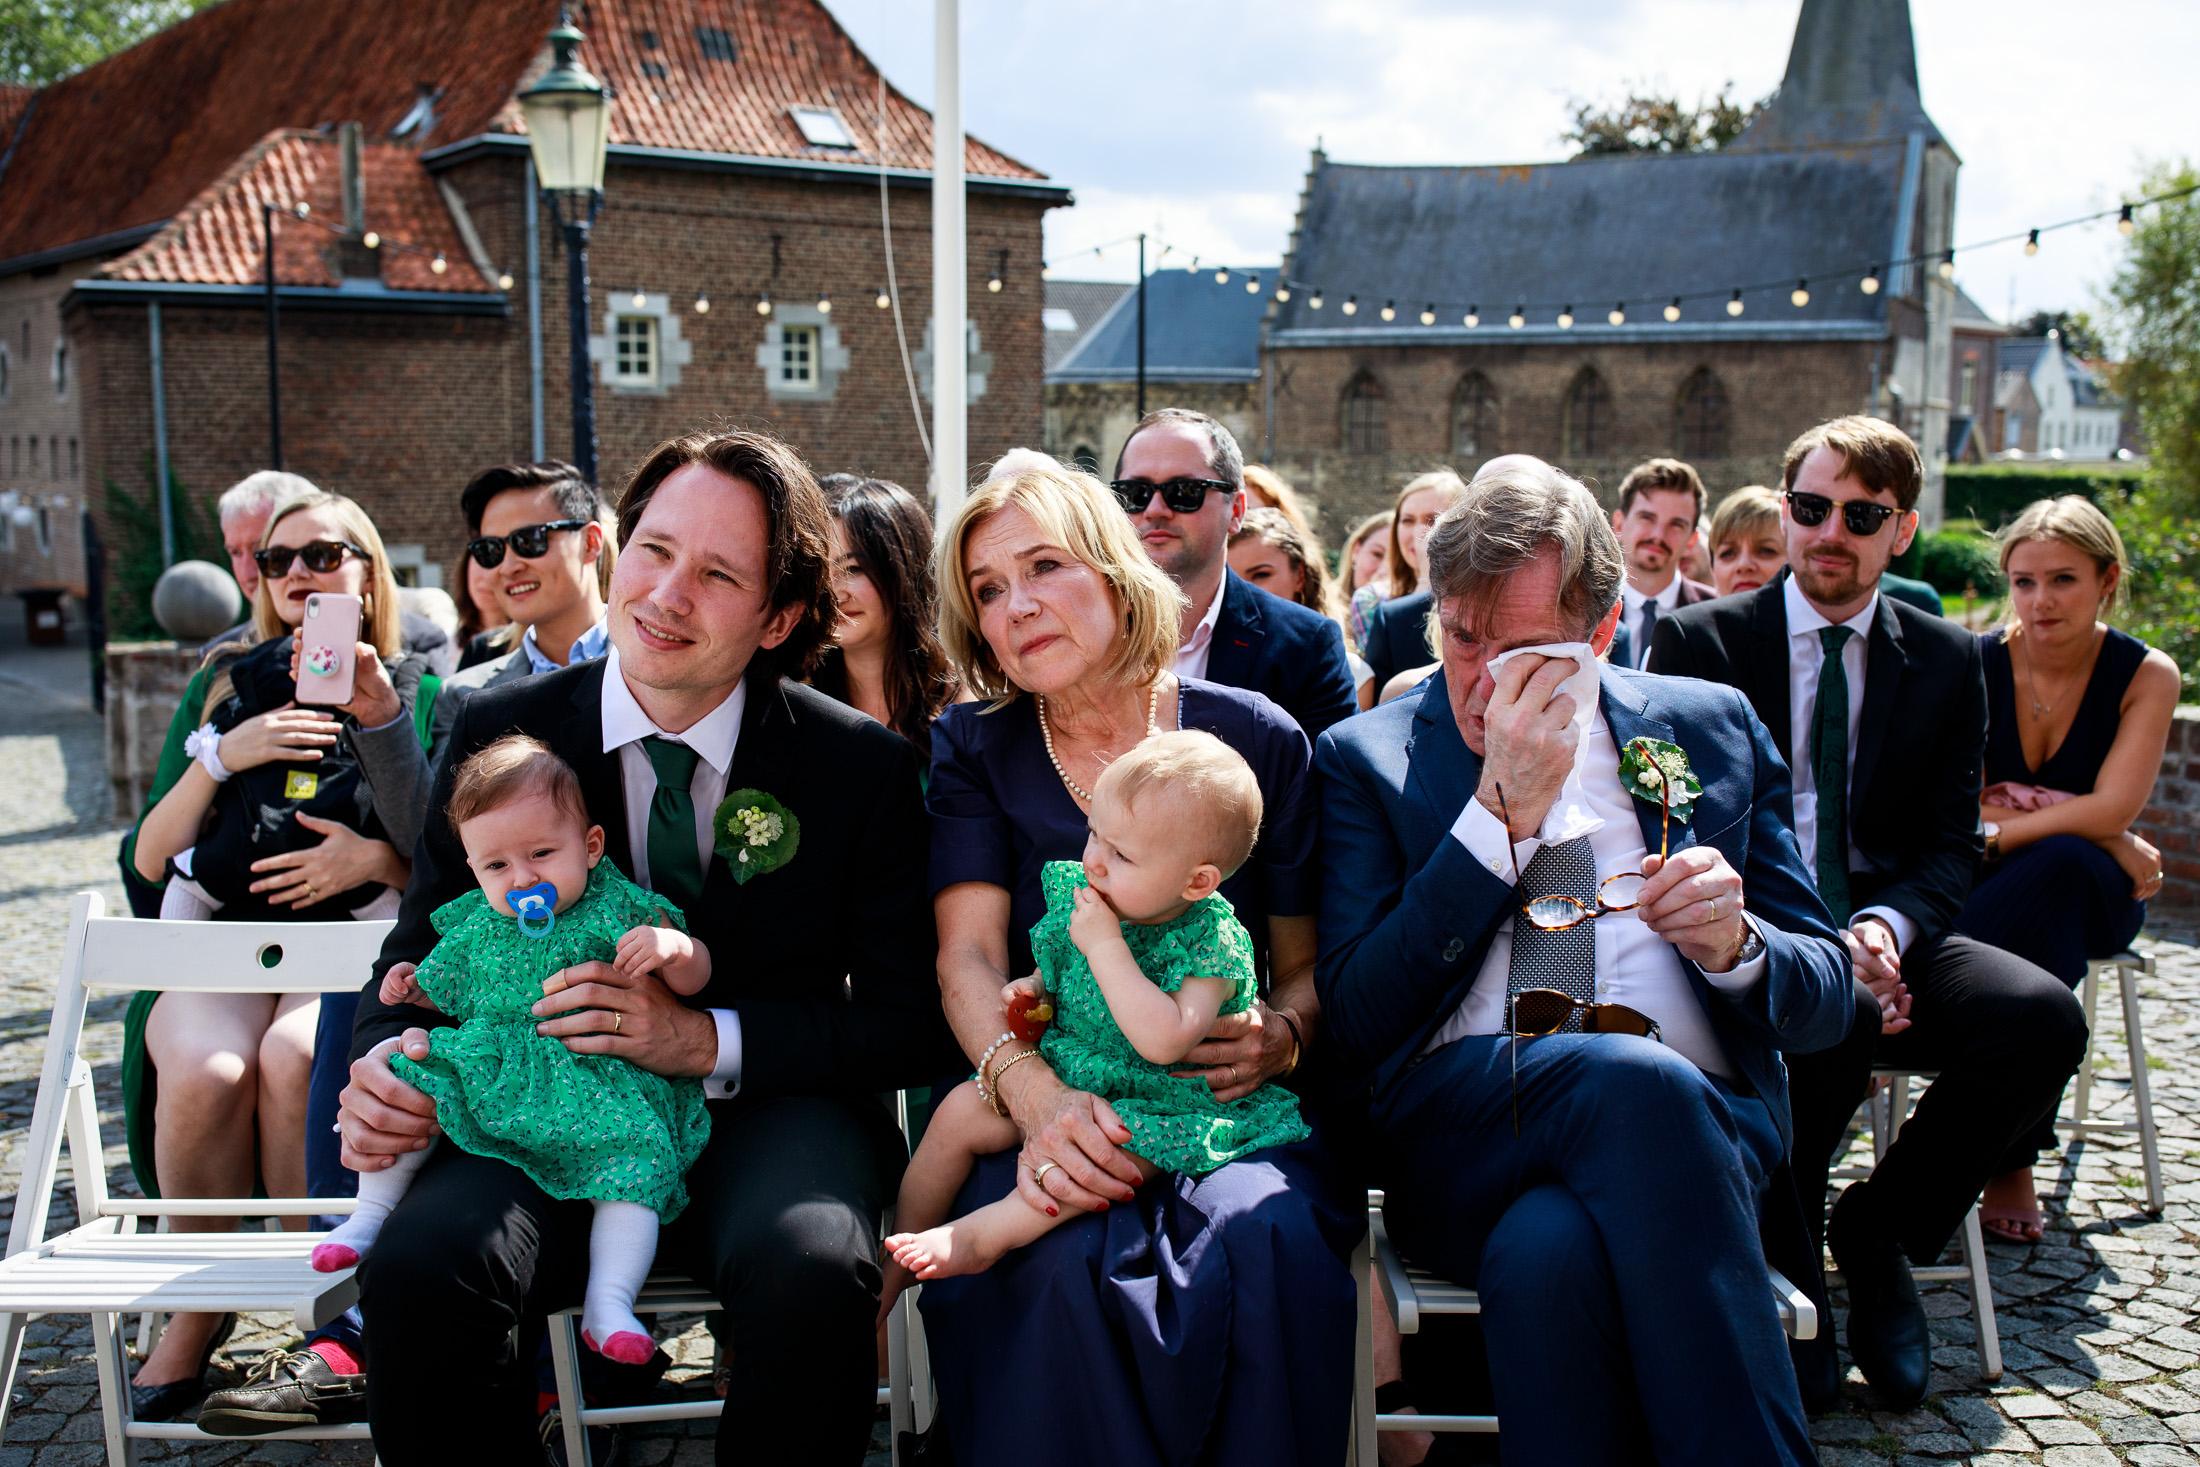 Trouwen bij Kasteel Limbricht   Trouwen in Limburg   Trouwfotograaf Limburg